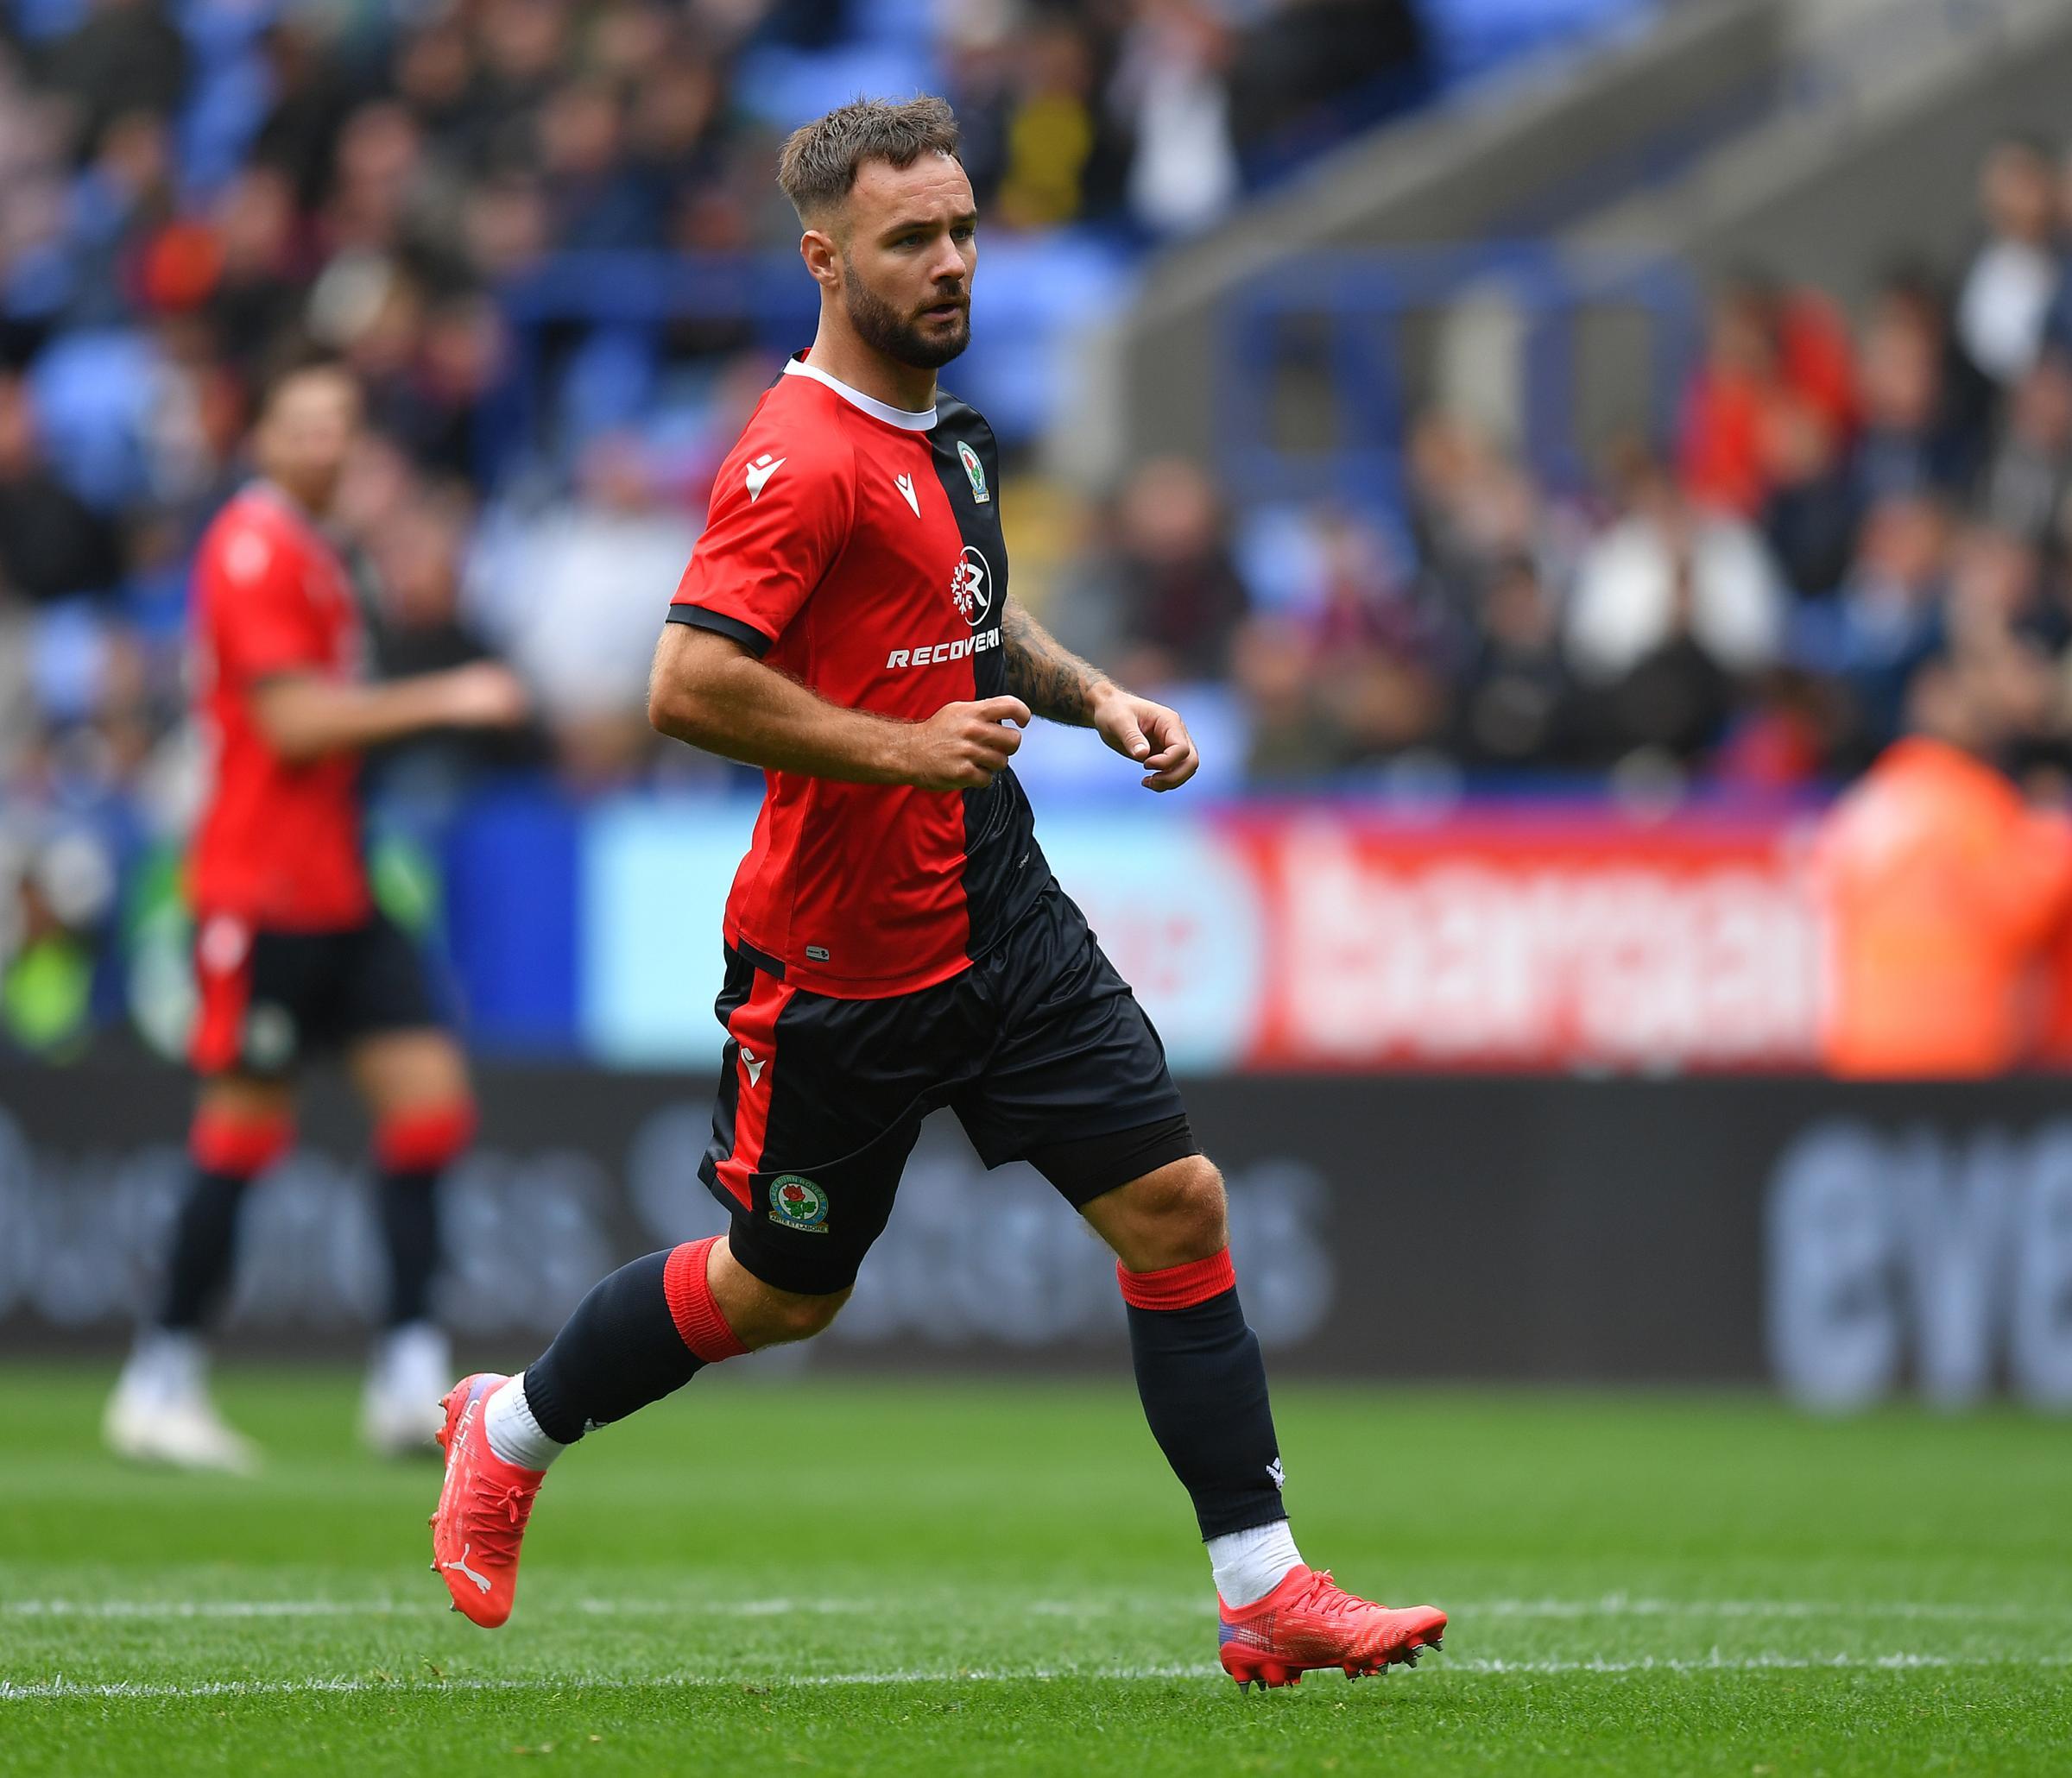 Premier League side won't pursue interest in Blackburn Rovers striker |  Lancashire Telegraph